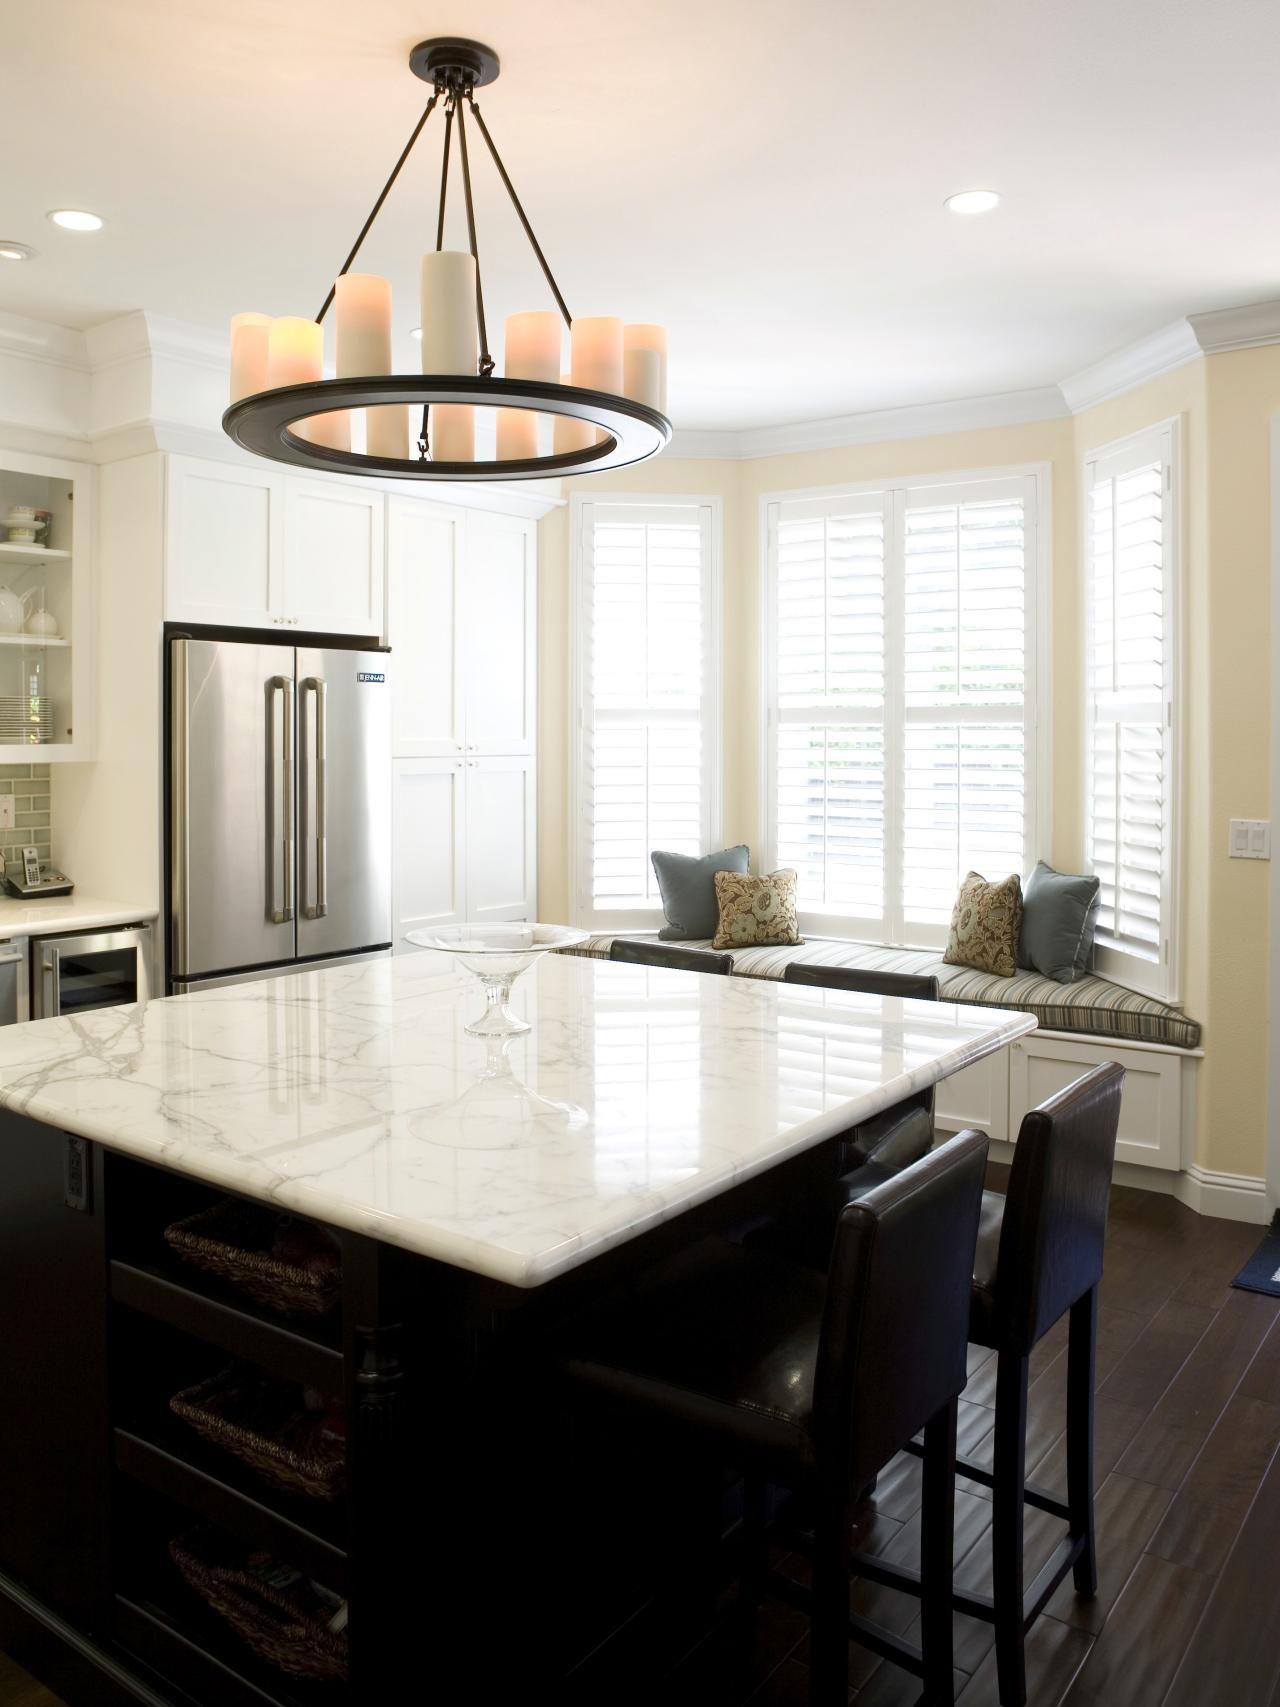 Kitchen Counter Decor Ideas Islands